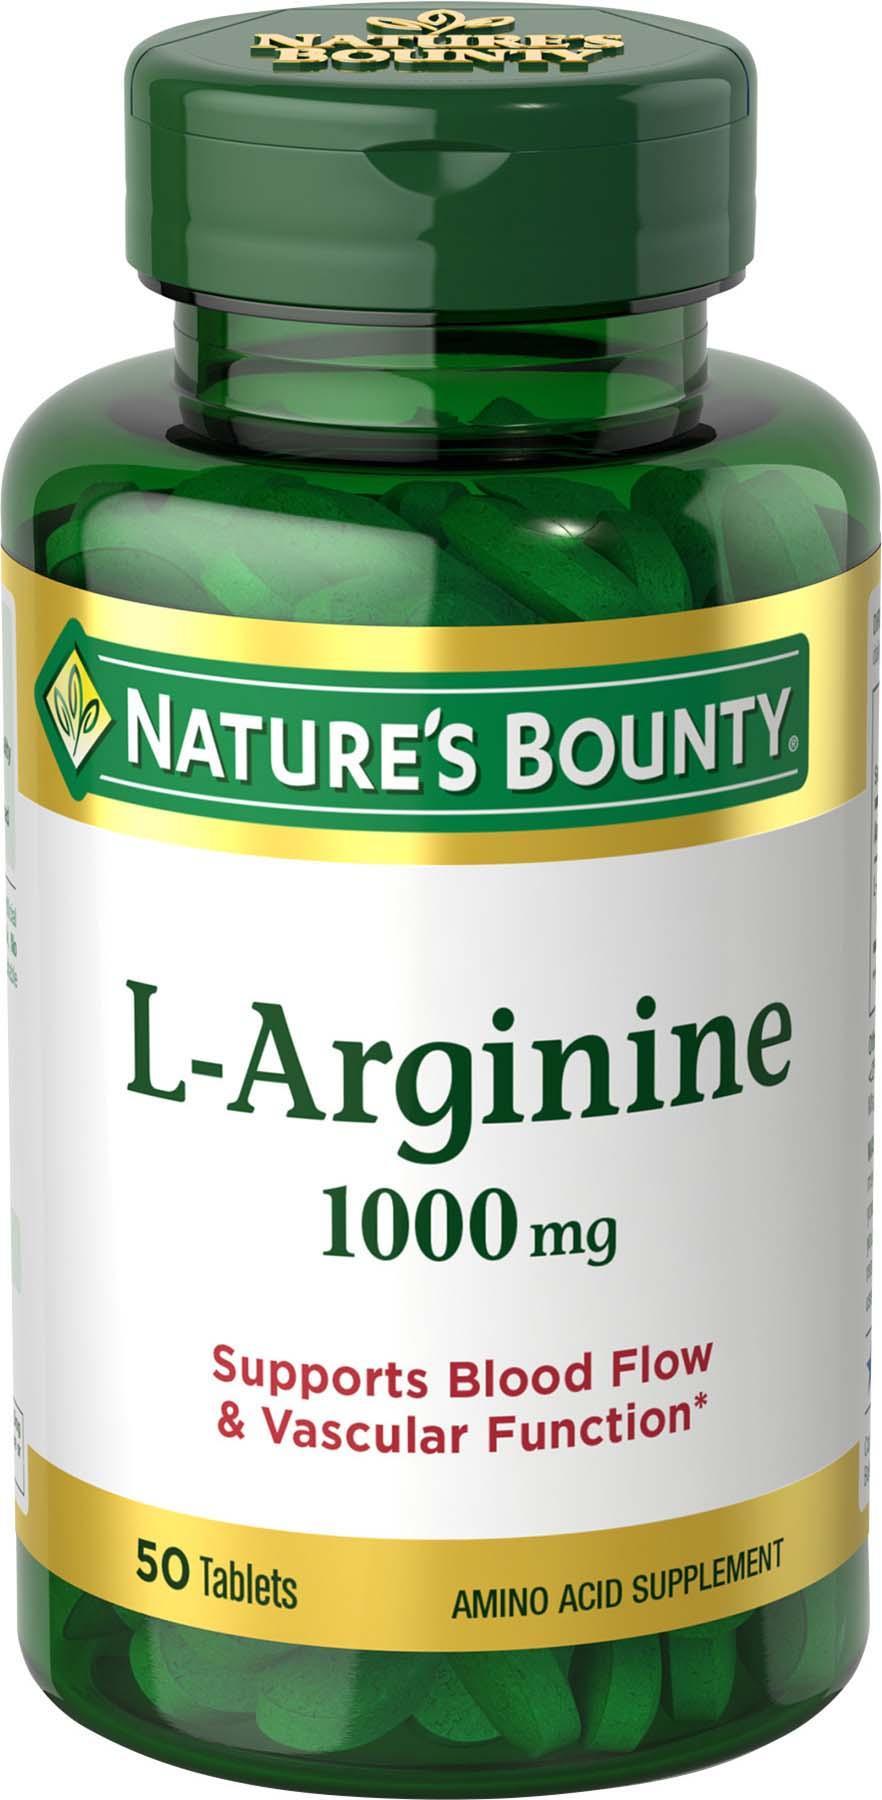 Amazon.com: Nature's Bounty L-Arginine 1000 mg, 50 Tablets ...